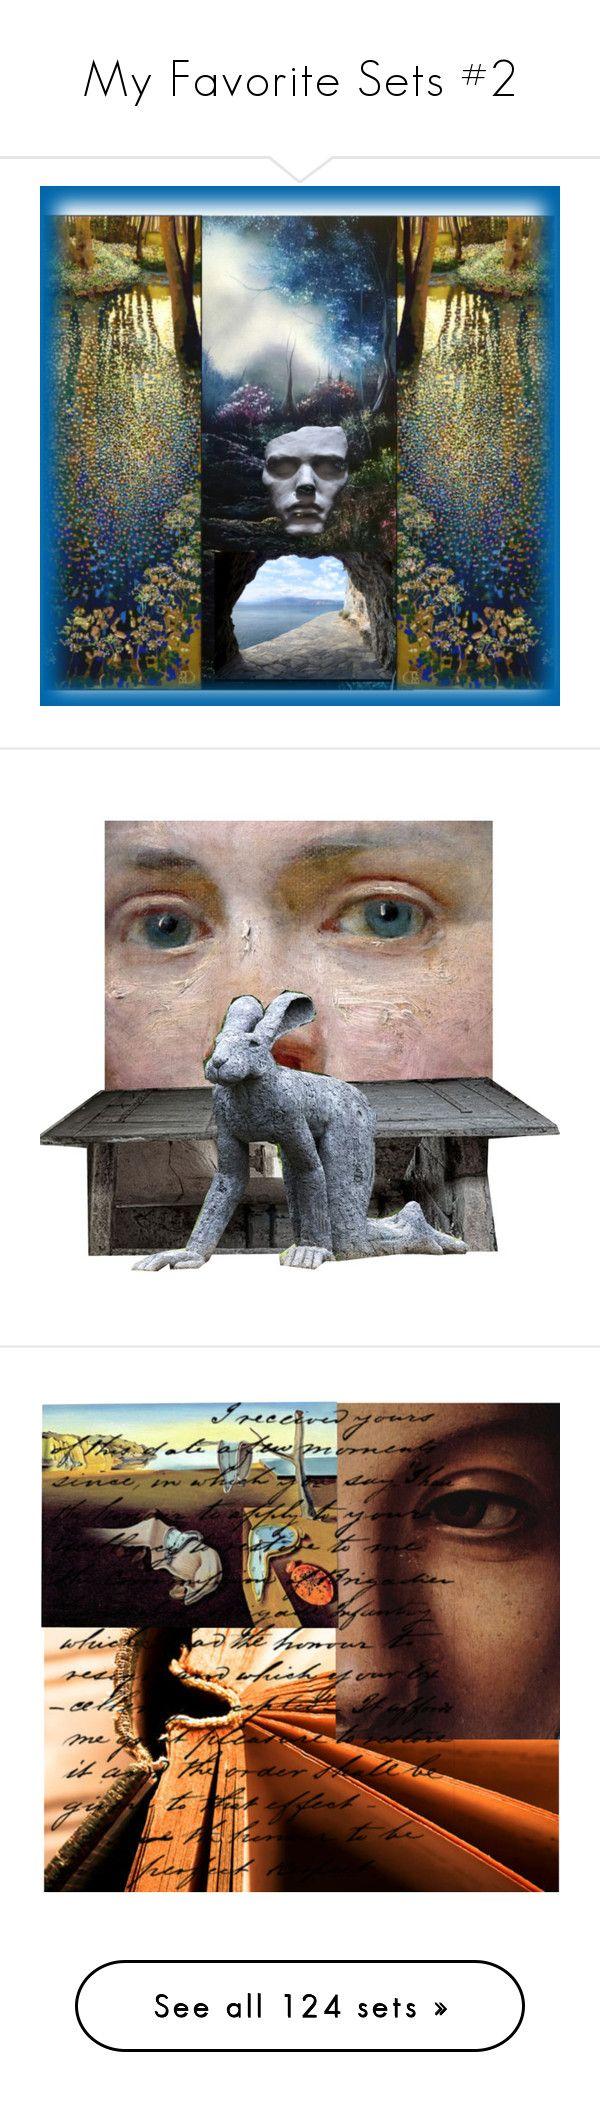 """My Favorite Sets #2"" by chilirose-creative ❤ liked on Polyvore featuring art, reflection, artexpression, portals, athousanddoors, artflashmob19, MemberSpotlight, etsyevolution, TheJetty and artflashmob18"